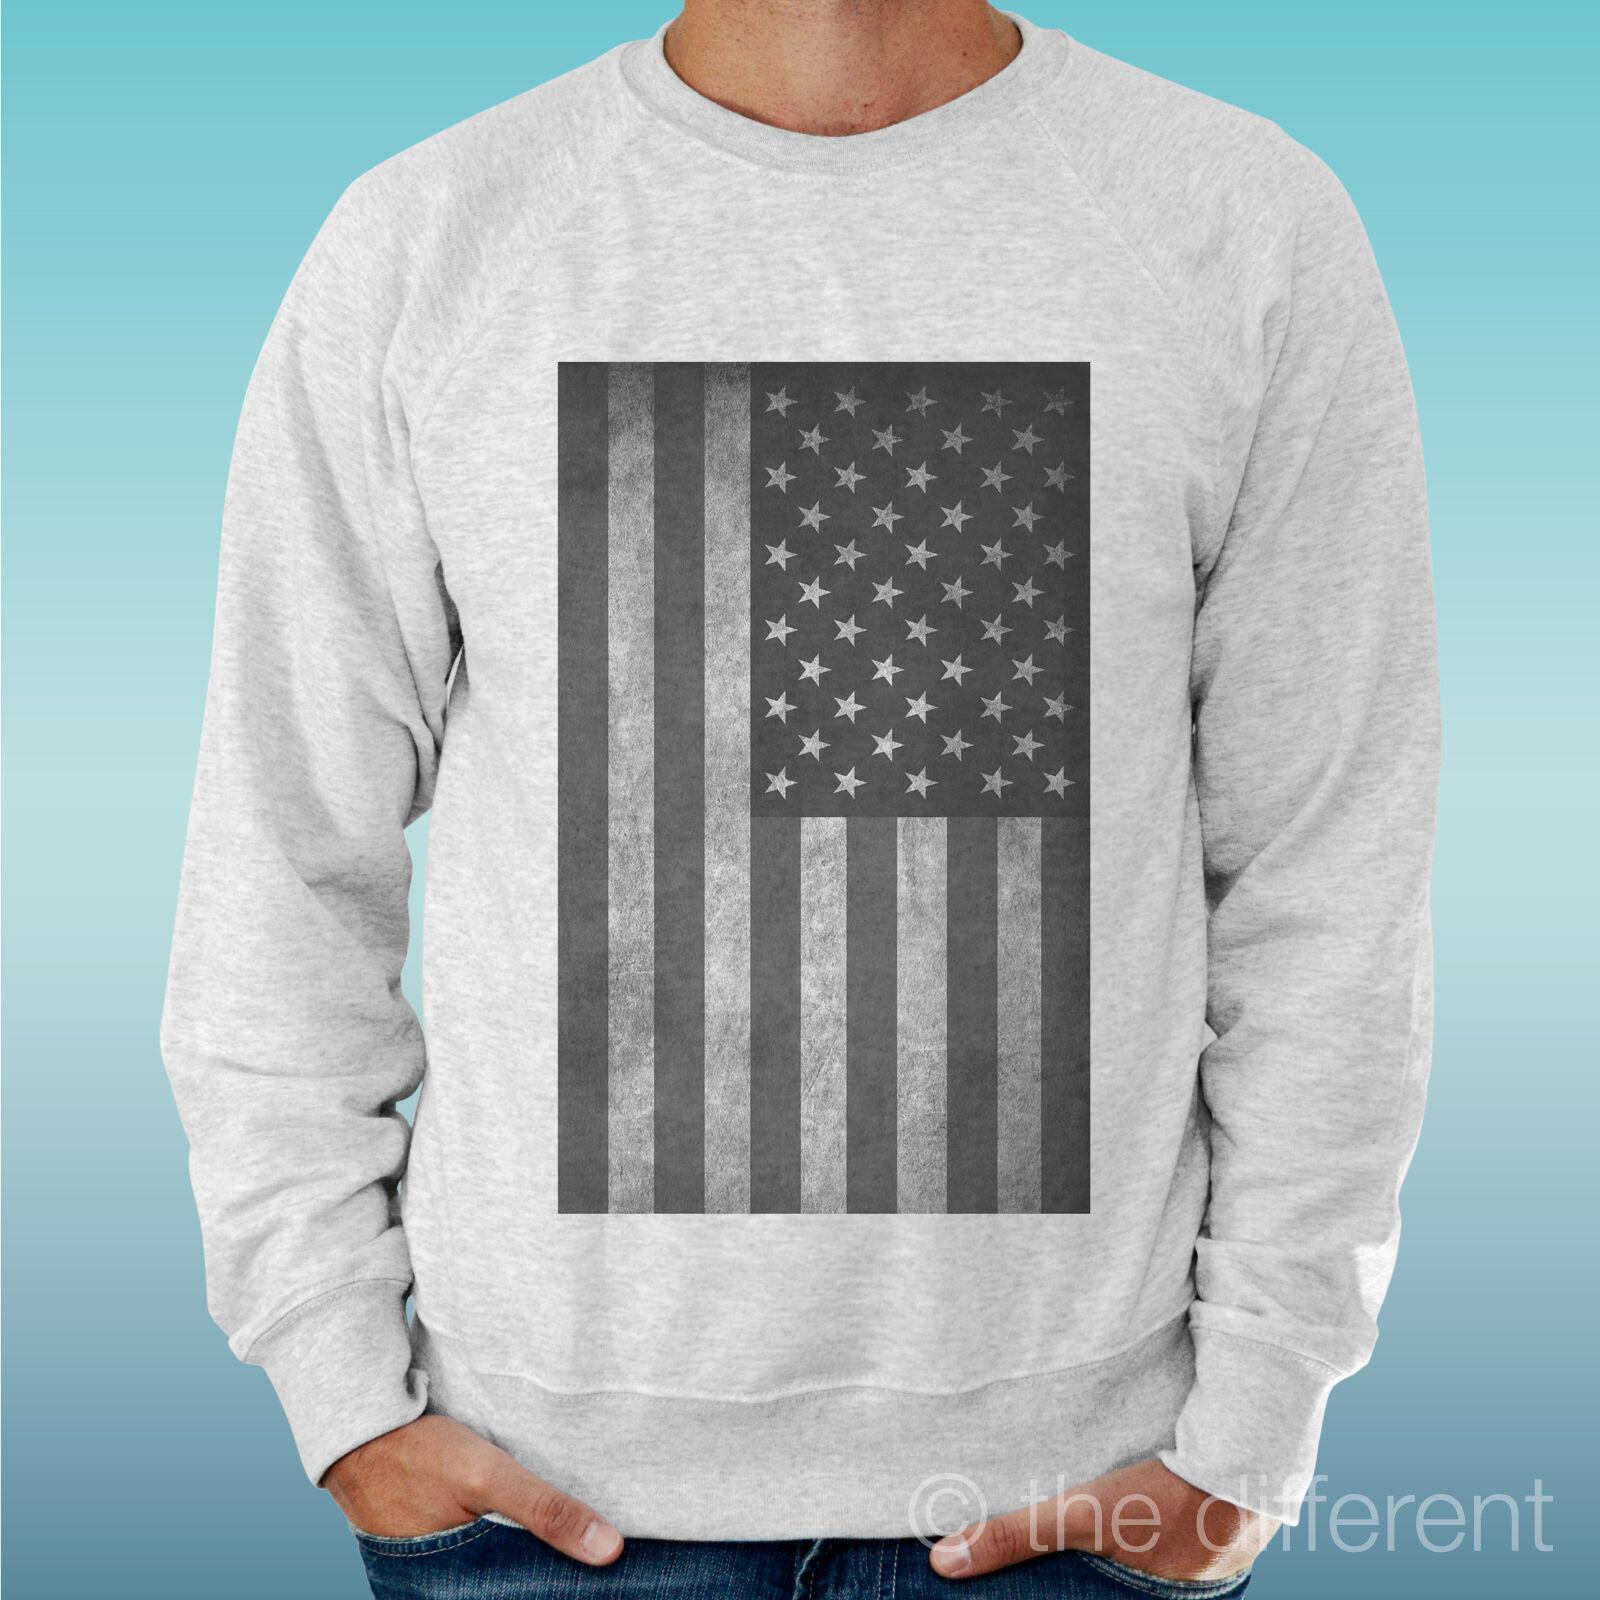 MEN'S SWEATSHIRT LIGHT SWEATER LIGHT GREY GREY   AMERICAN FLAG FLAG AMERICA